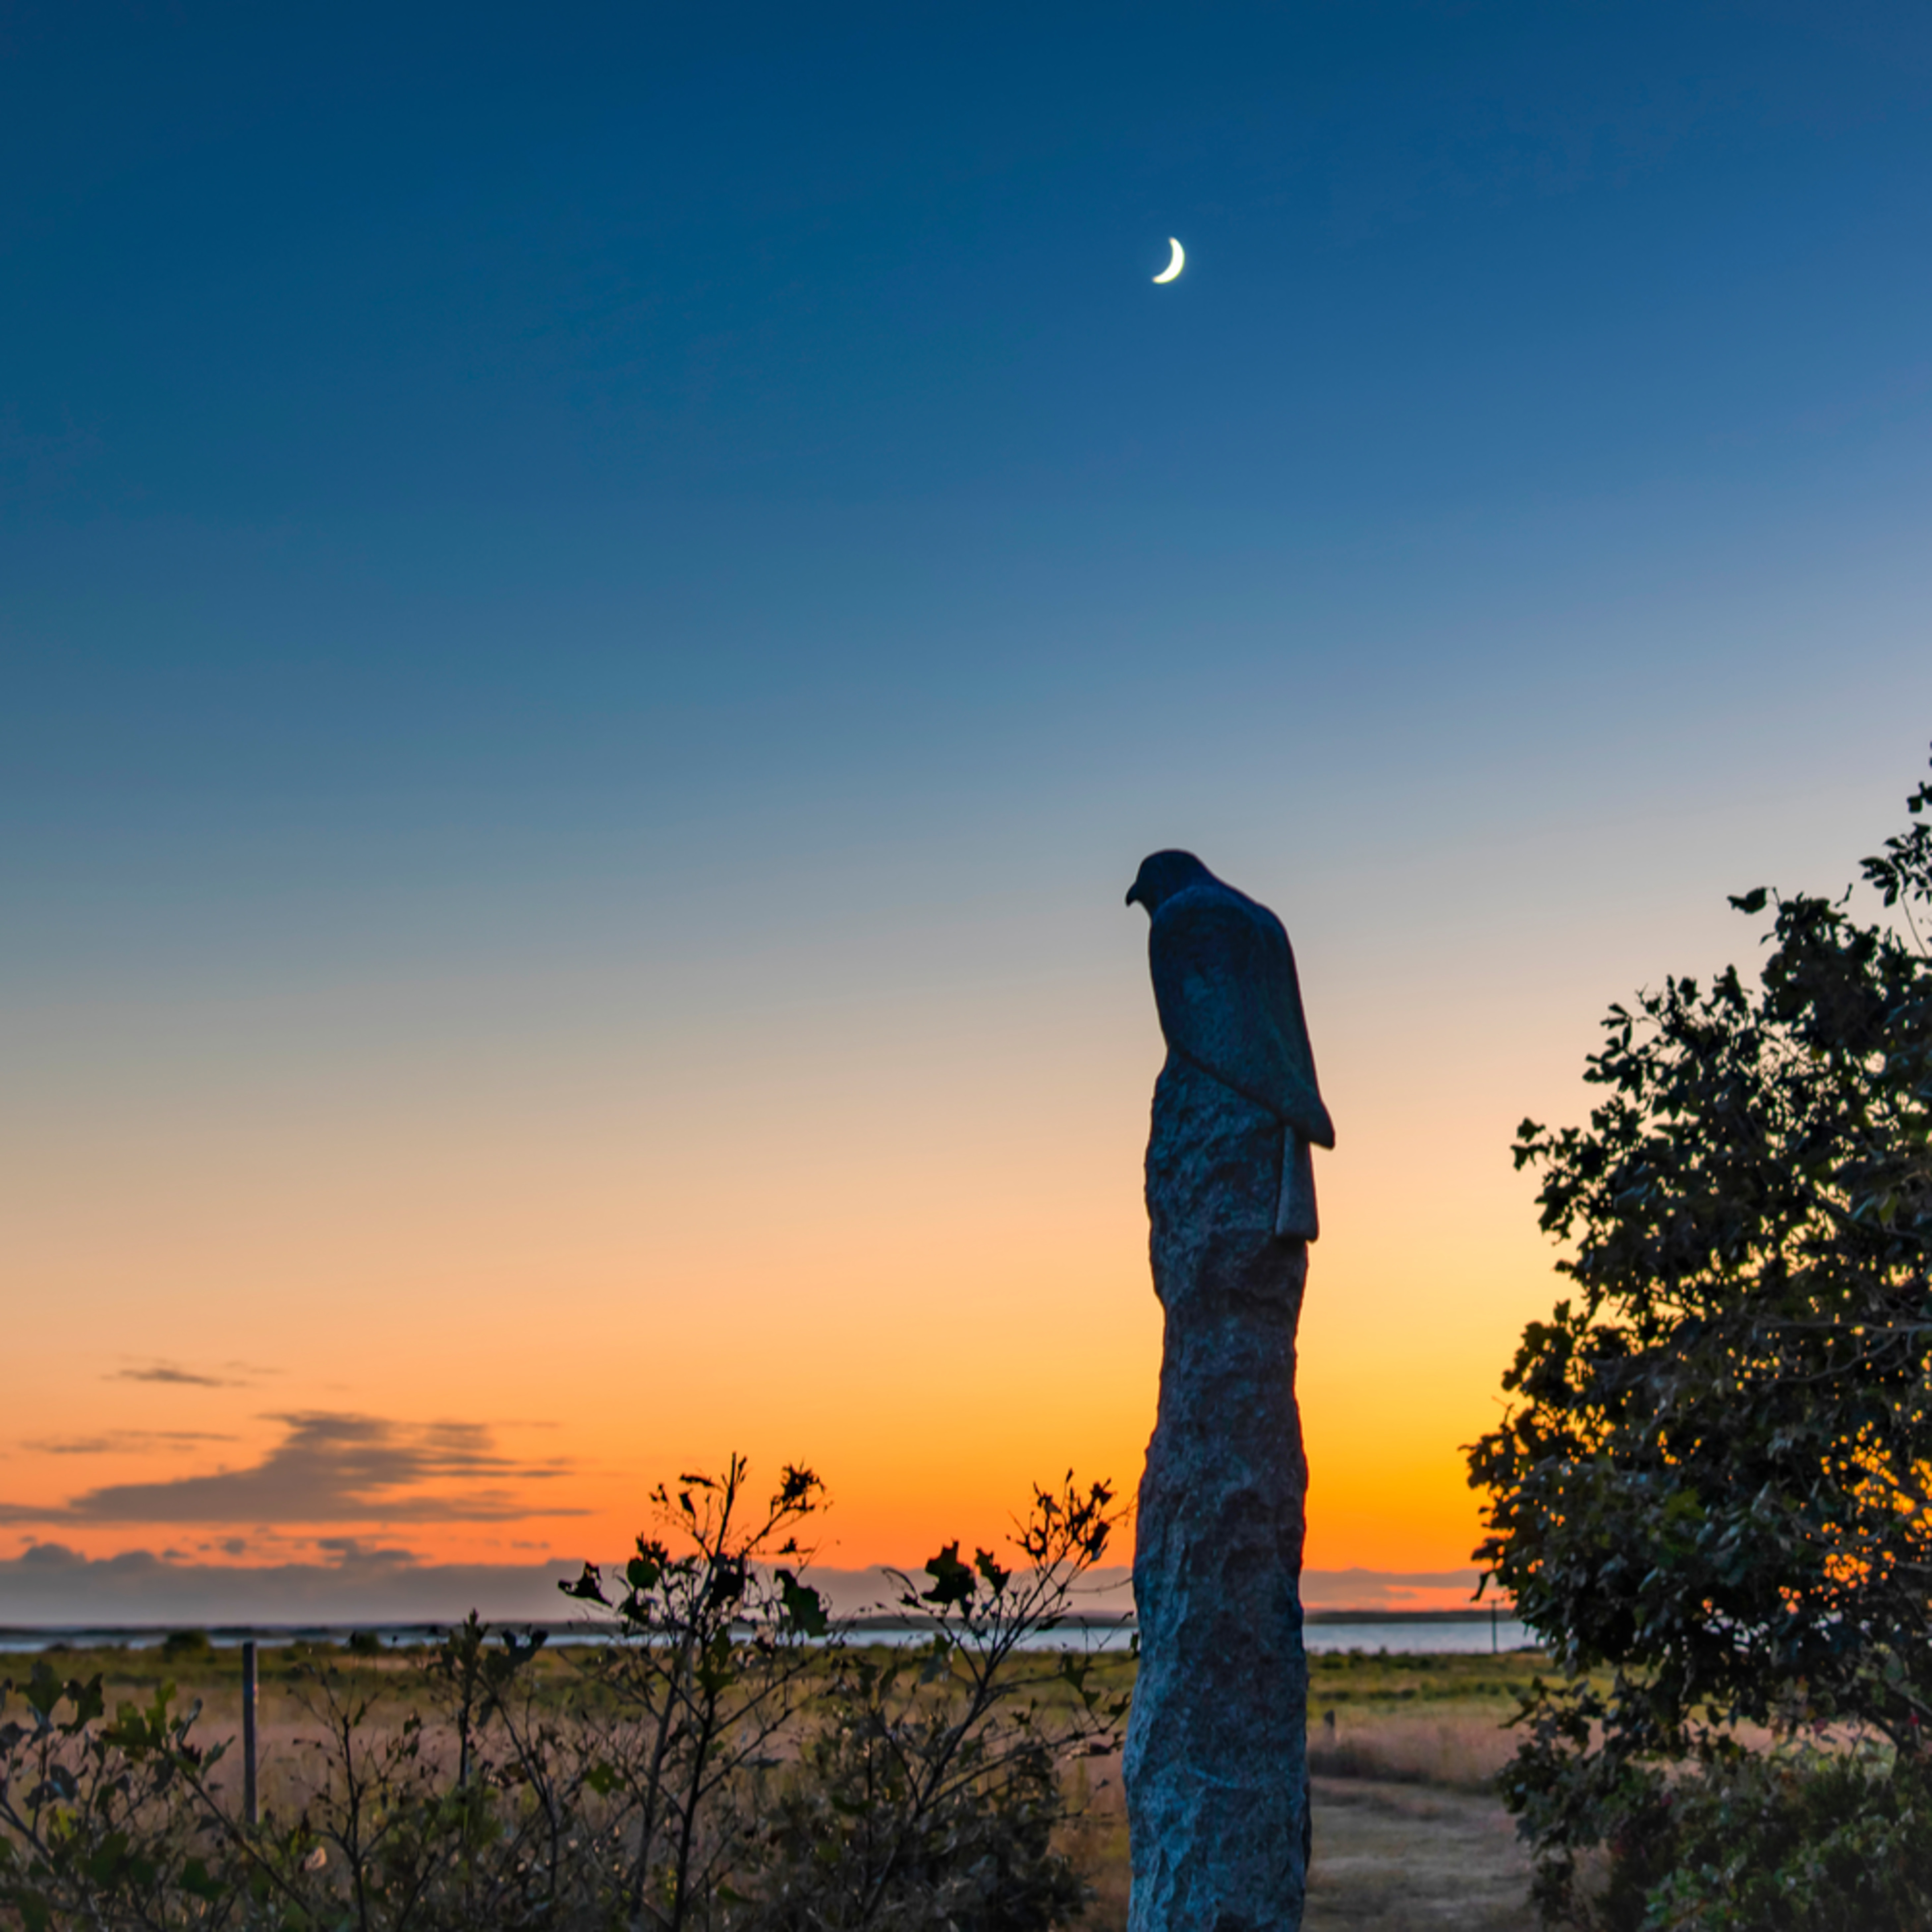 Long point statue sunset nf7svd